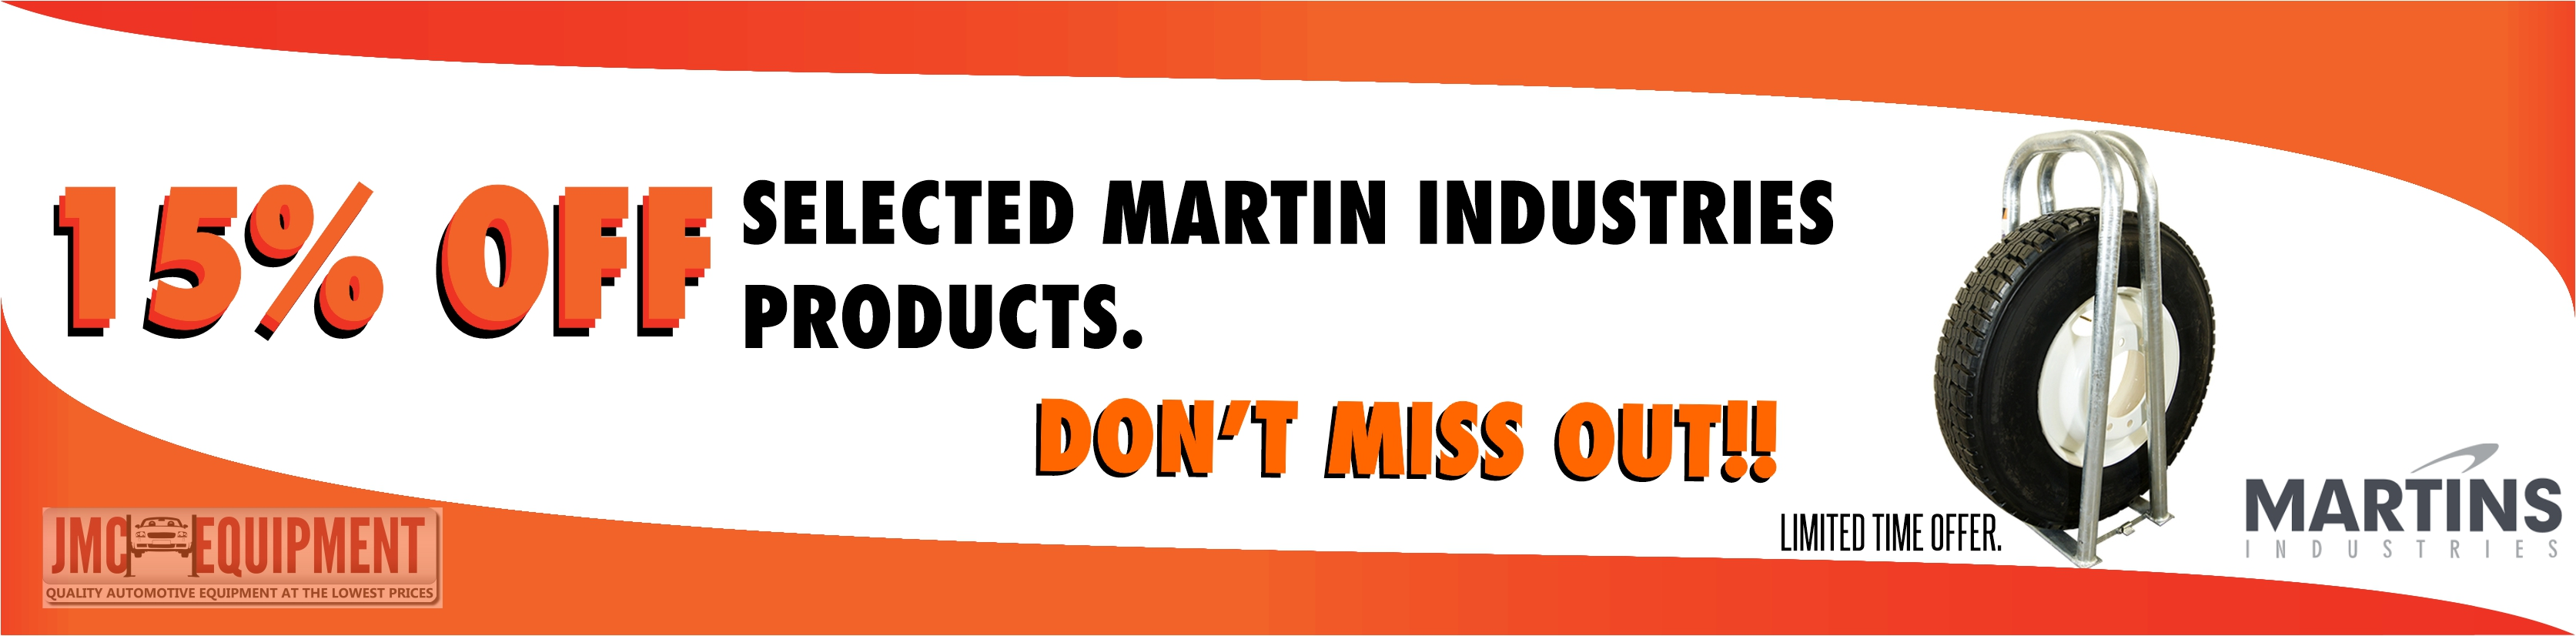 martin-industries-sin-boton.jpg